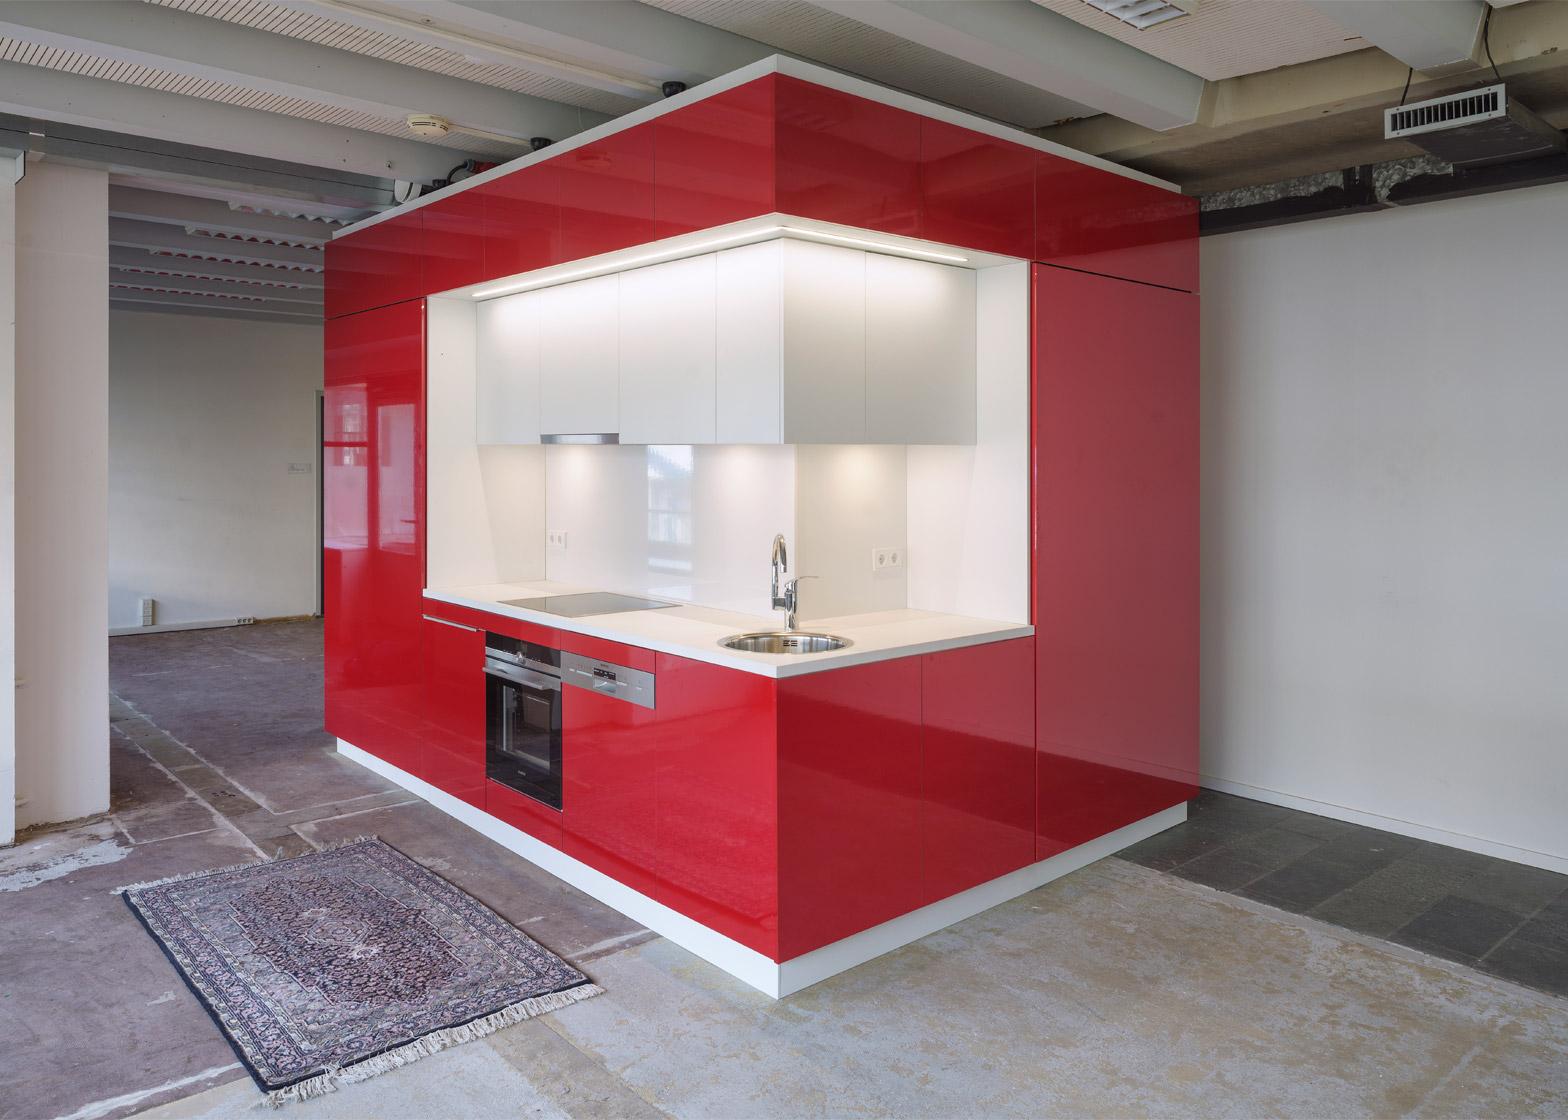 The Hub (Kraaijvanger Architects)